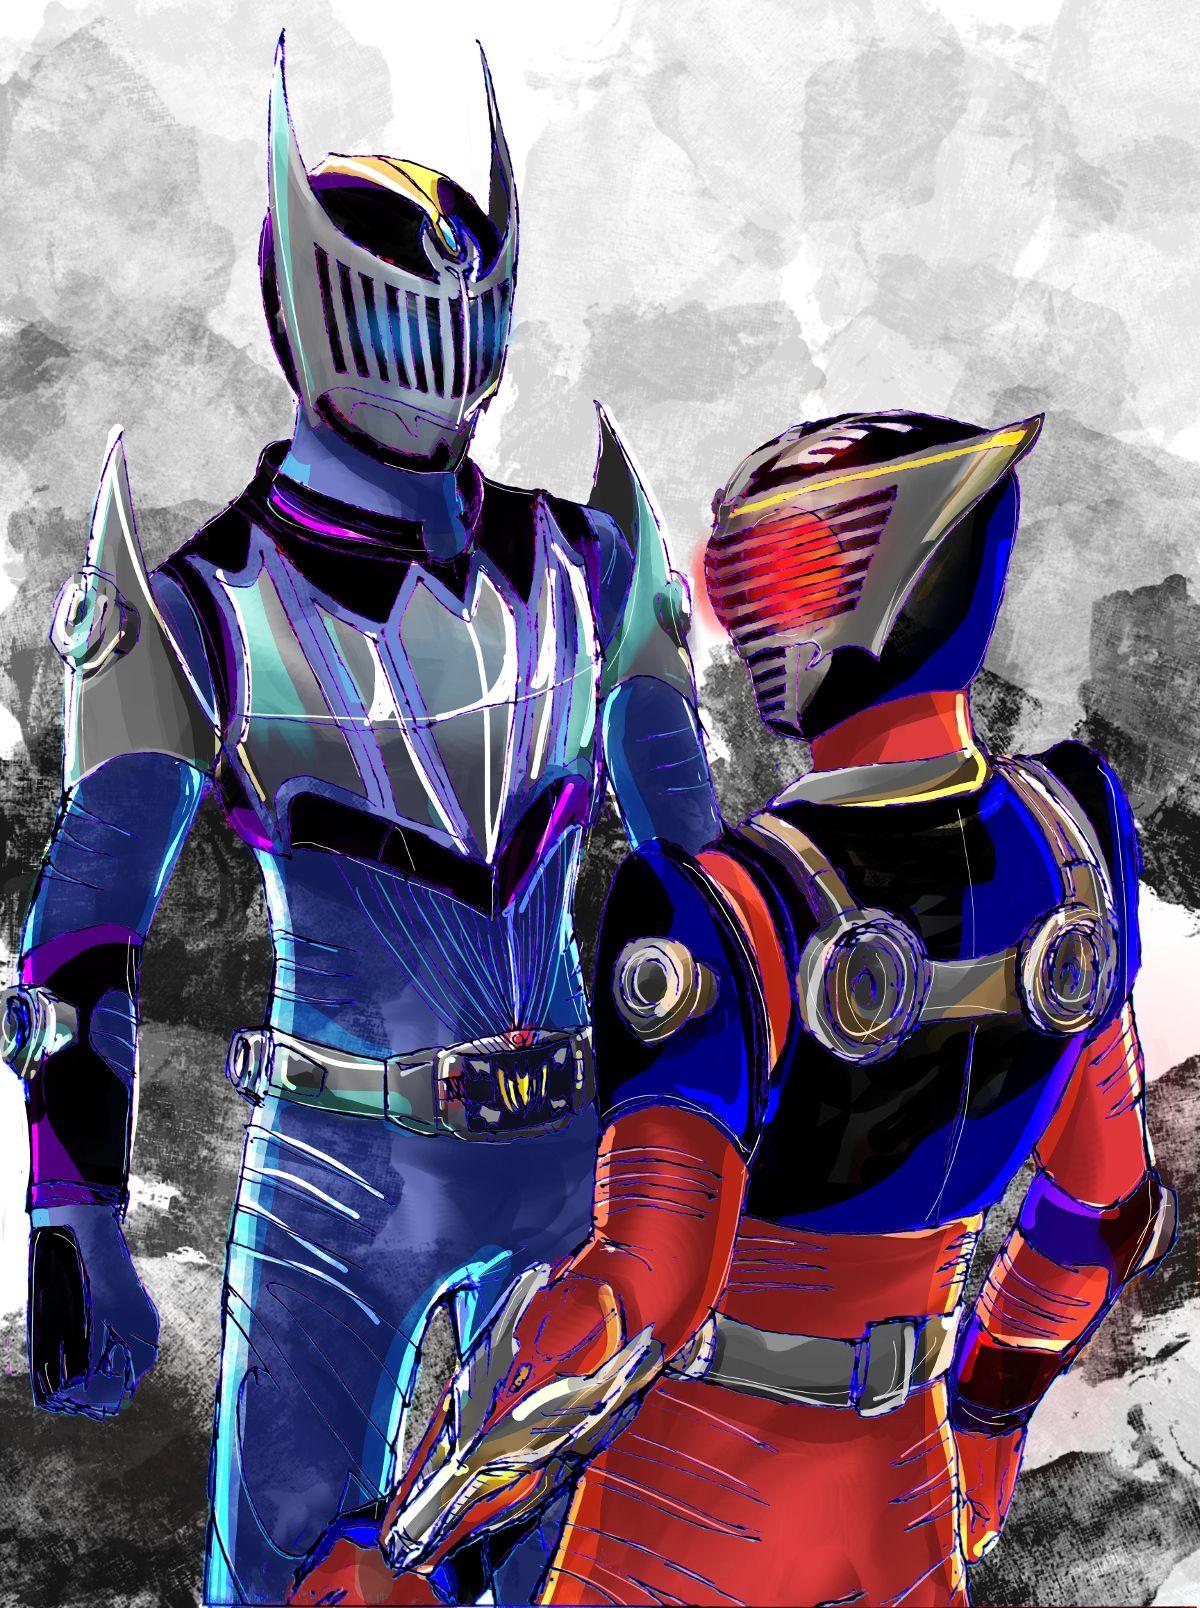 kamen rider ryuki kamen rider knight kamen rider kamen rider ryuki kamen rider kabuto